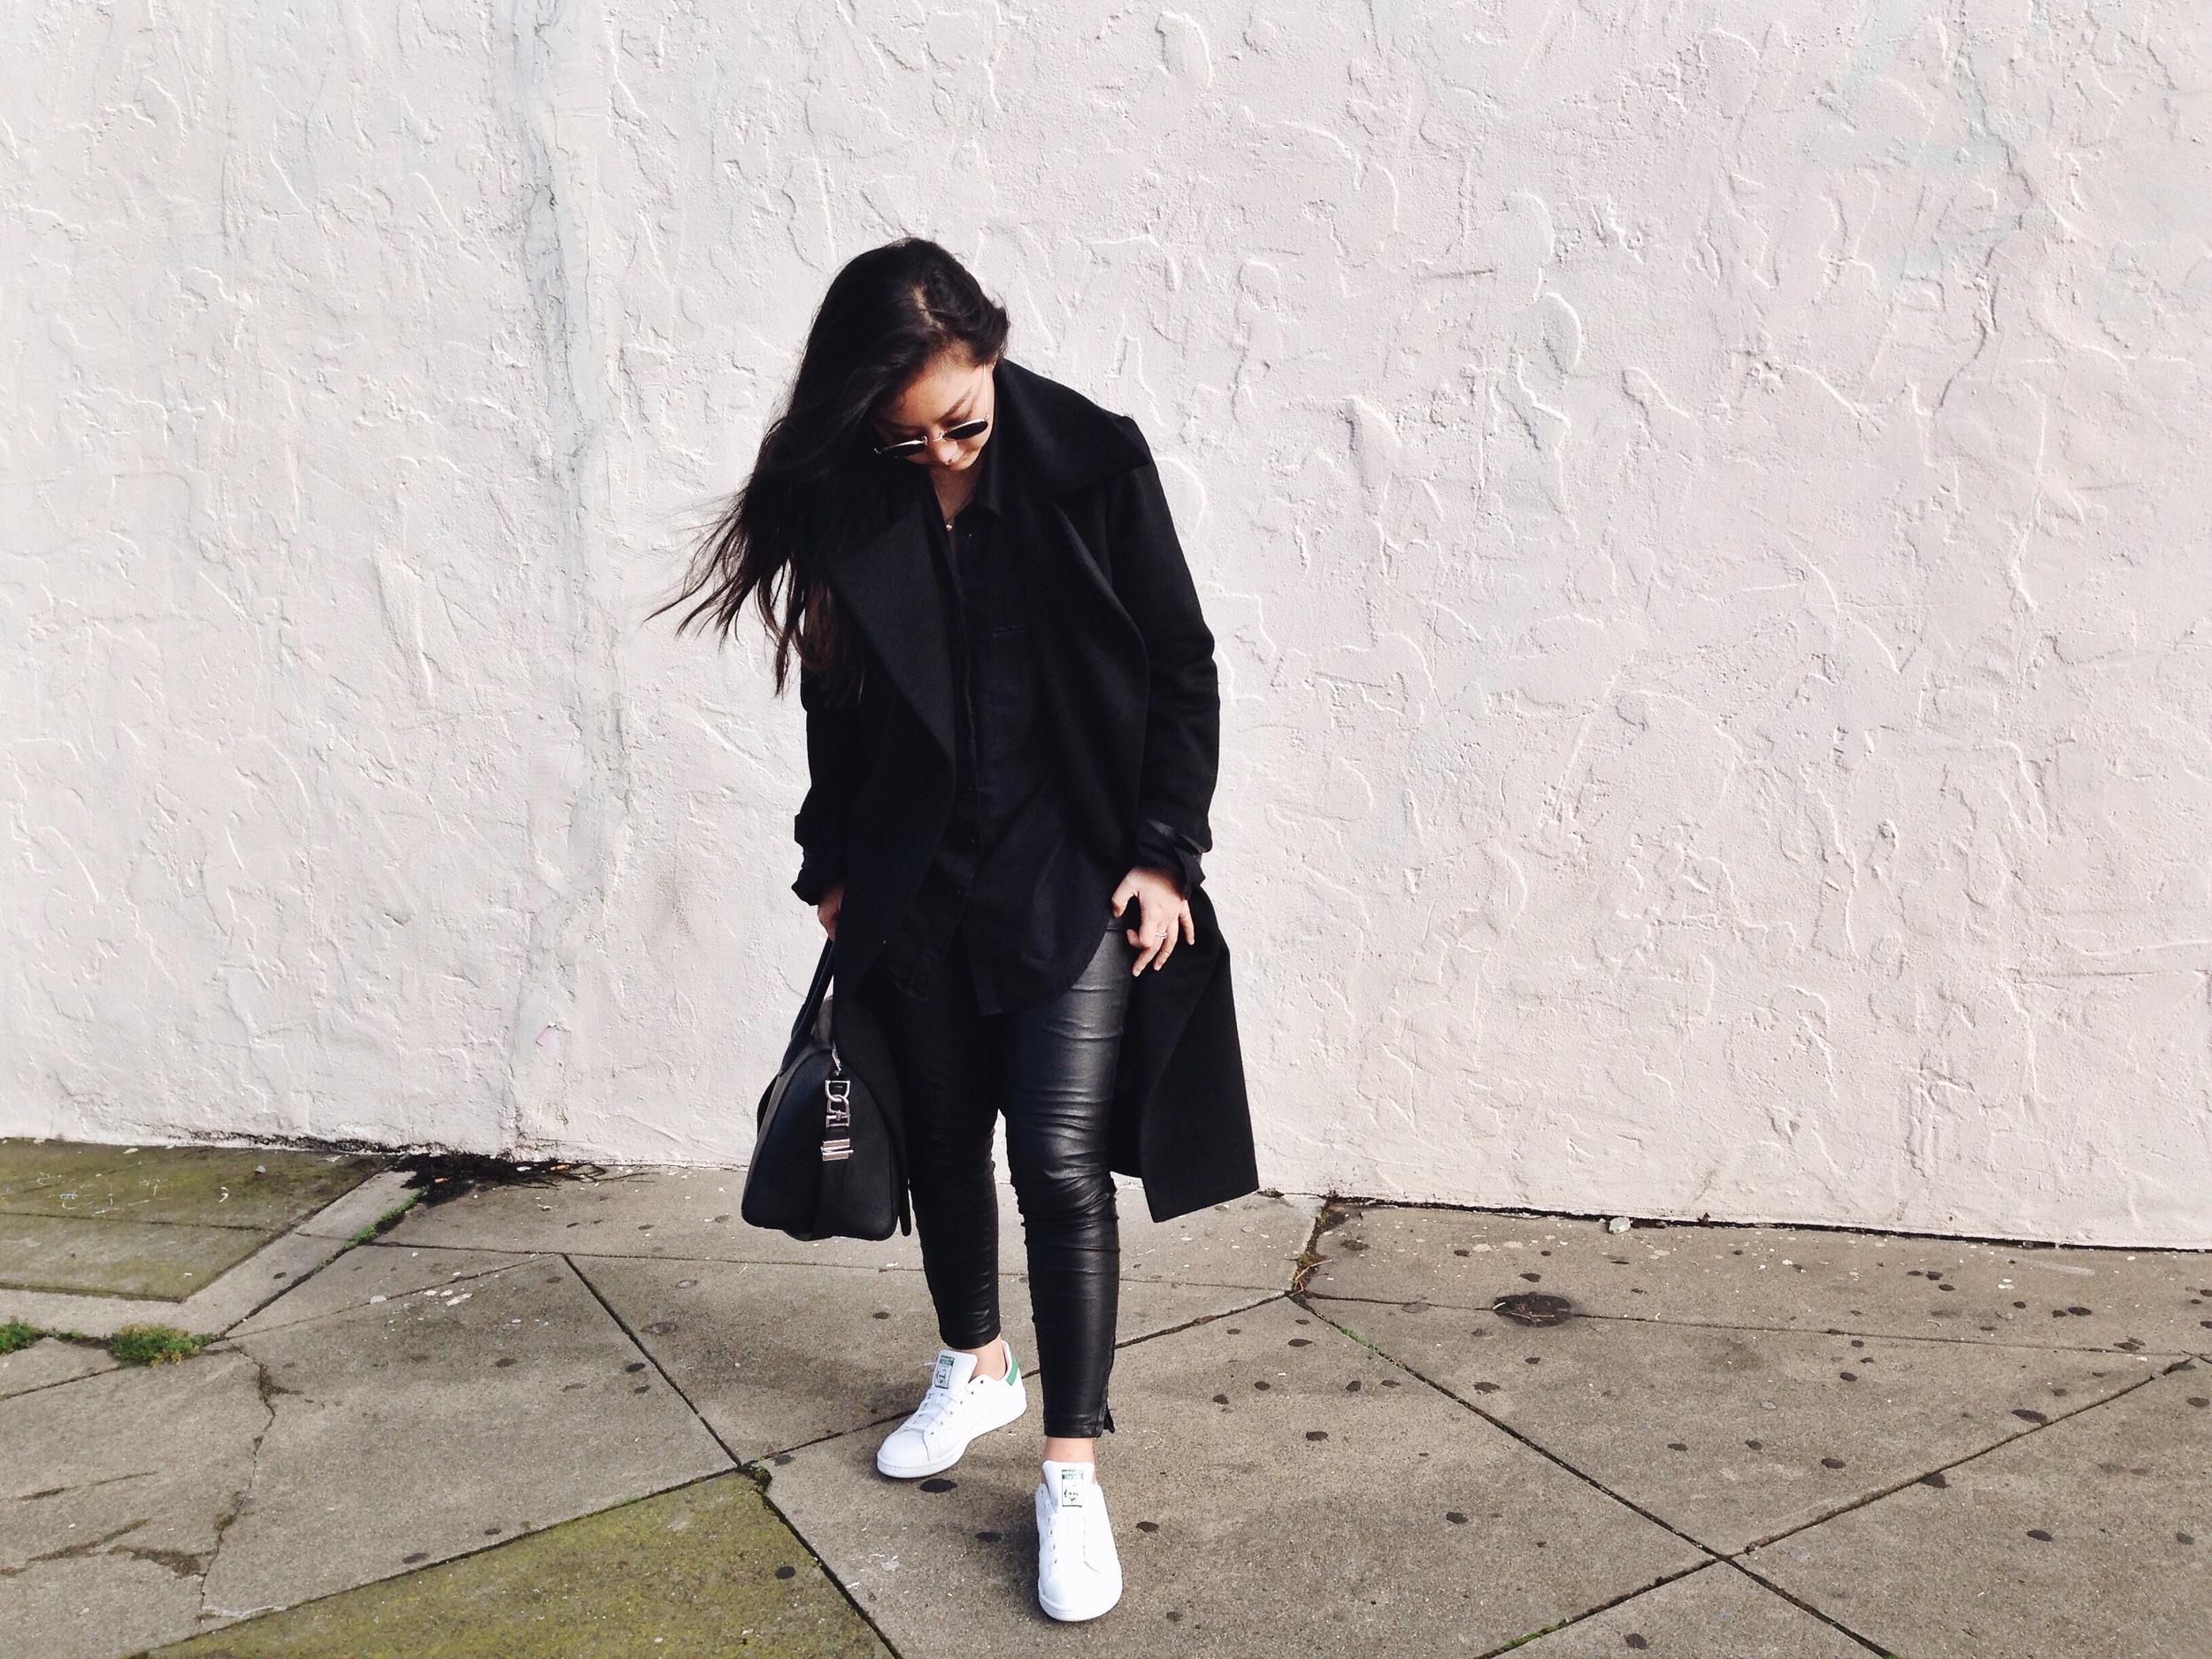 CUSTOM-DESIGNED maxi coat /  BLANK DENIM   vegan leather leggings  / ADIDAS  Stan Smith sneakers  / GIVENCHY  Antigona tote  / R AY-BAN   retro-roundsunglasses